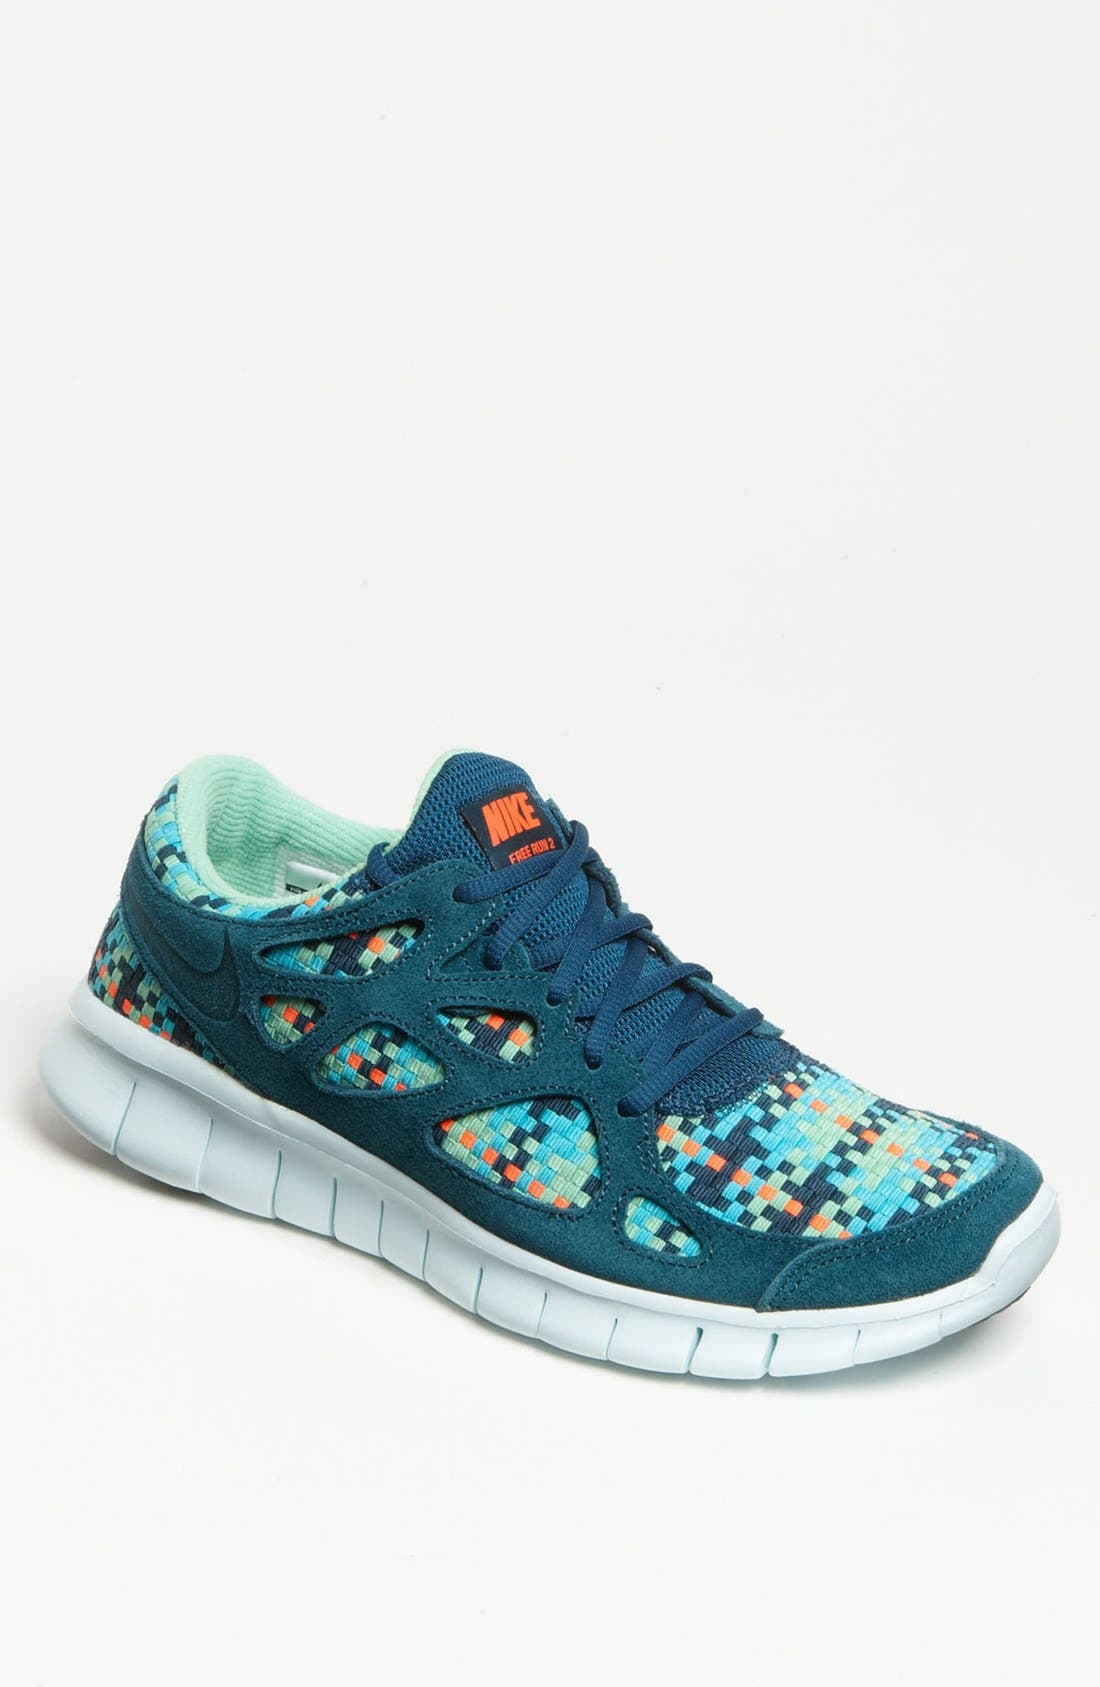 Main Image - Nike 'Free Run 2' Woven Sneaker (Men)